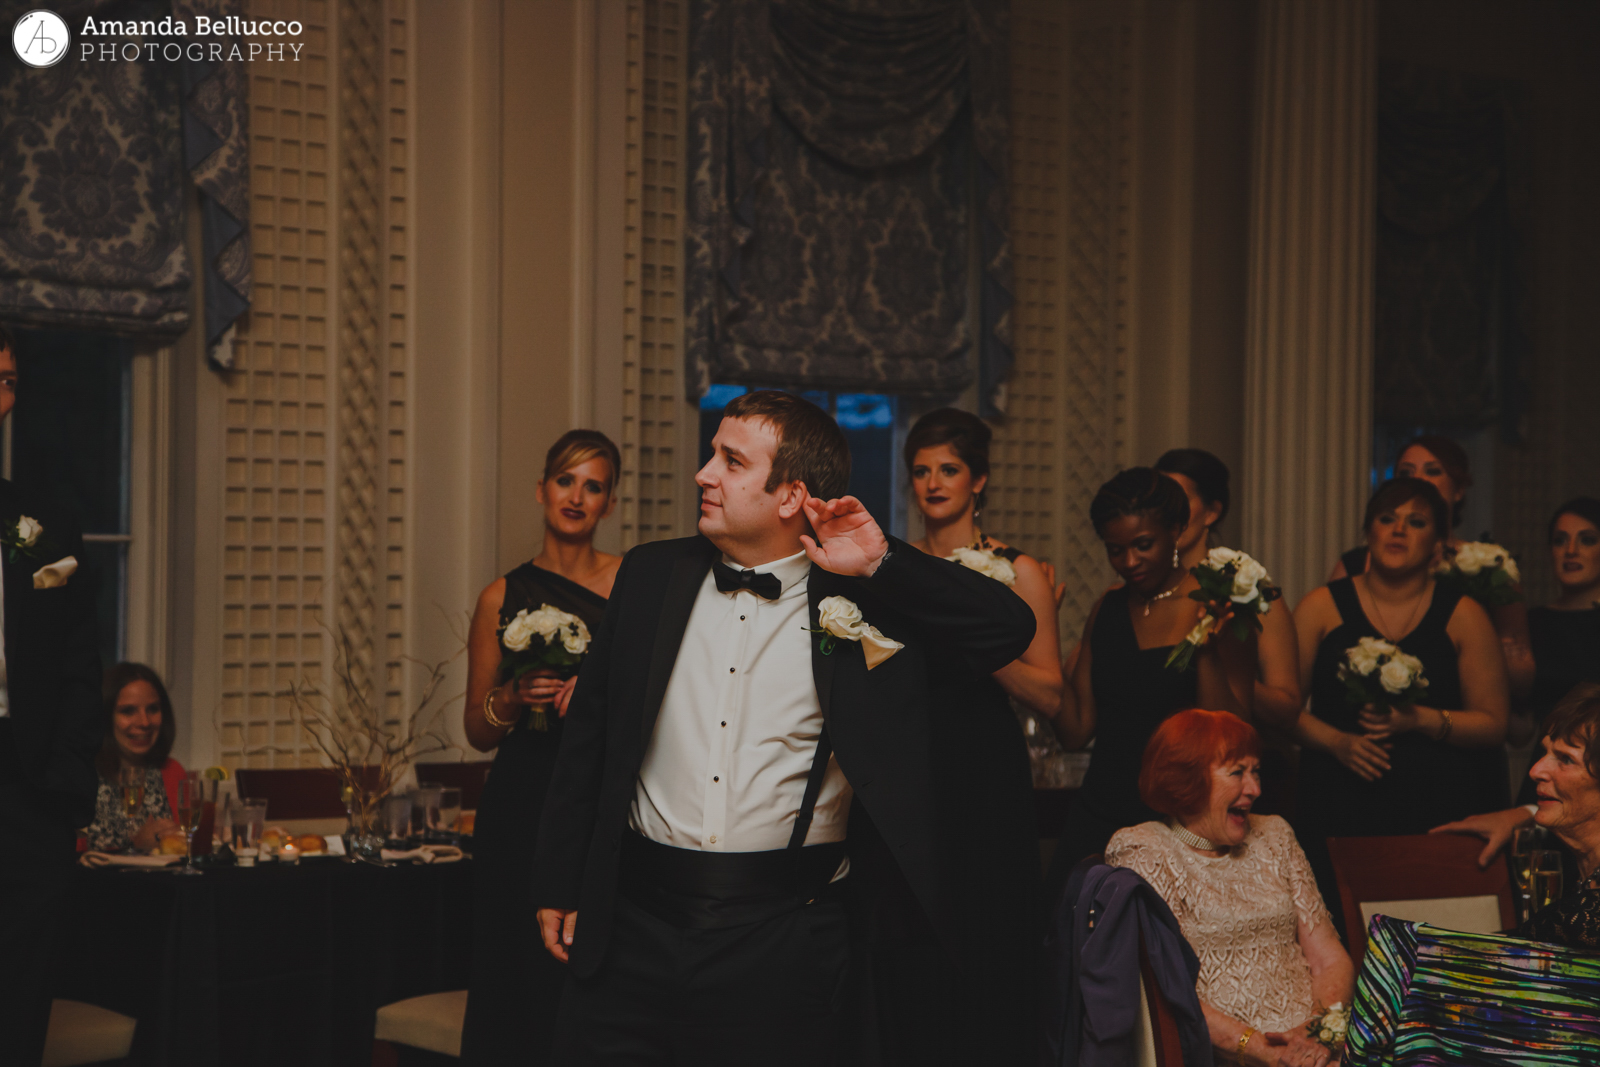 syracuse-rochester-fine-art-wedding-photographer-144.JPG